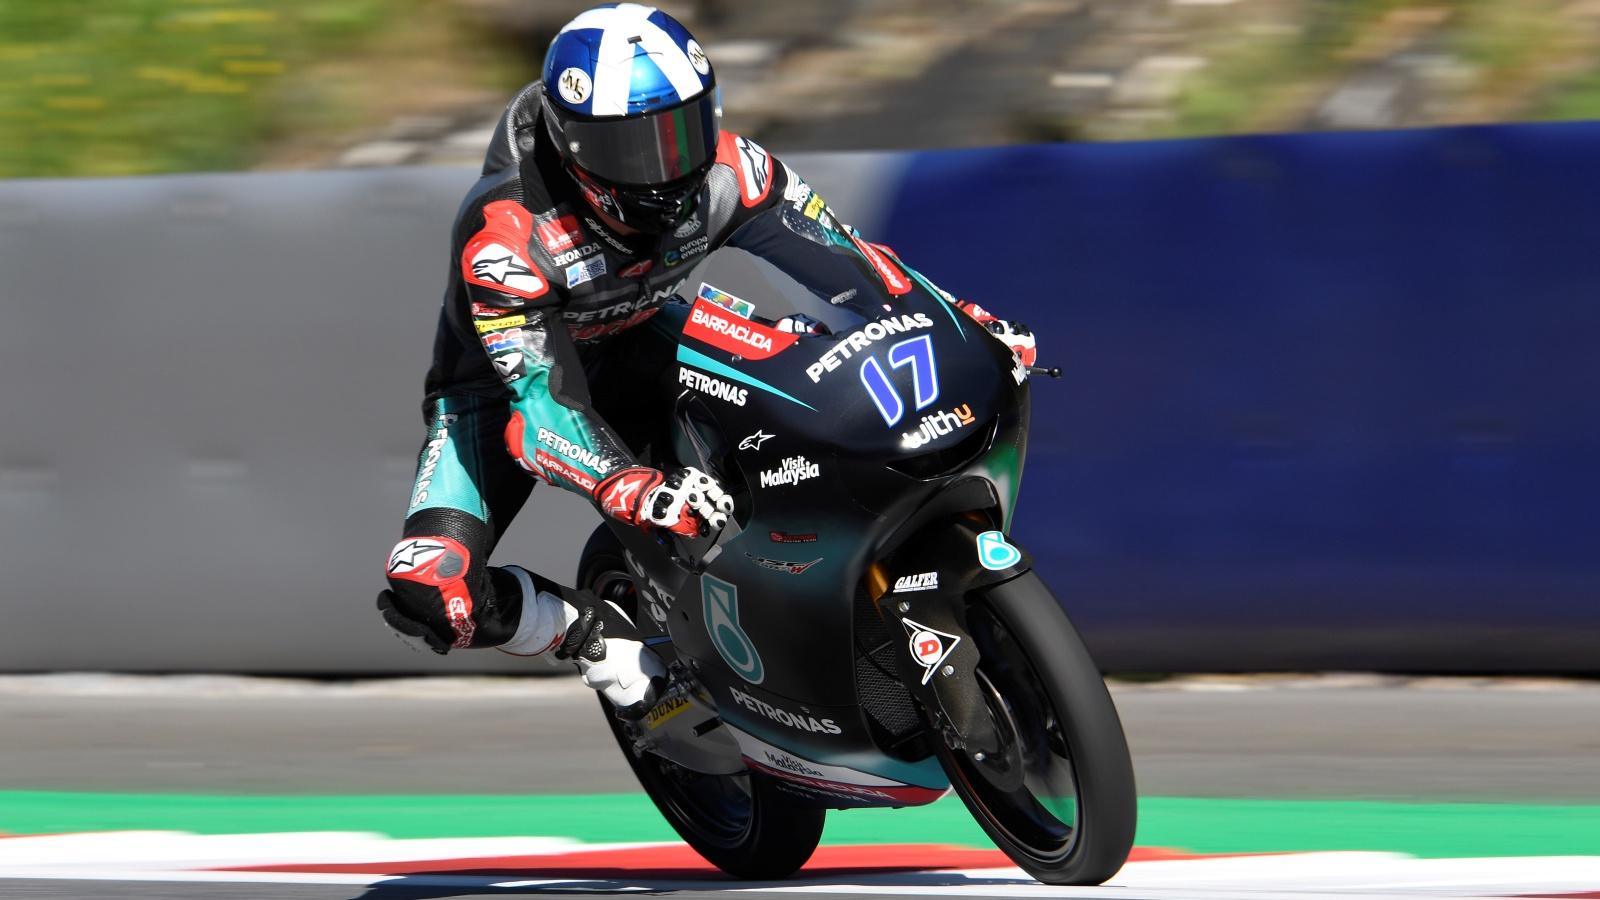 Penalizados 16 pilotos de Moto3: Romano Fenati sin pole, es para John McPhee